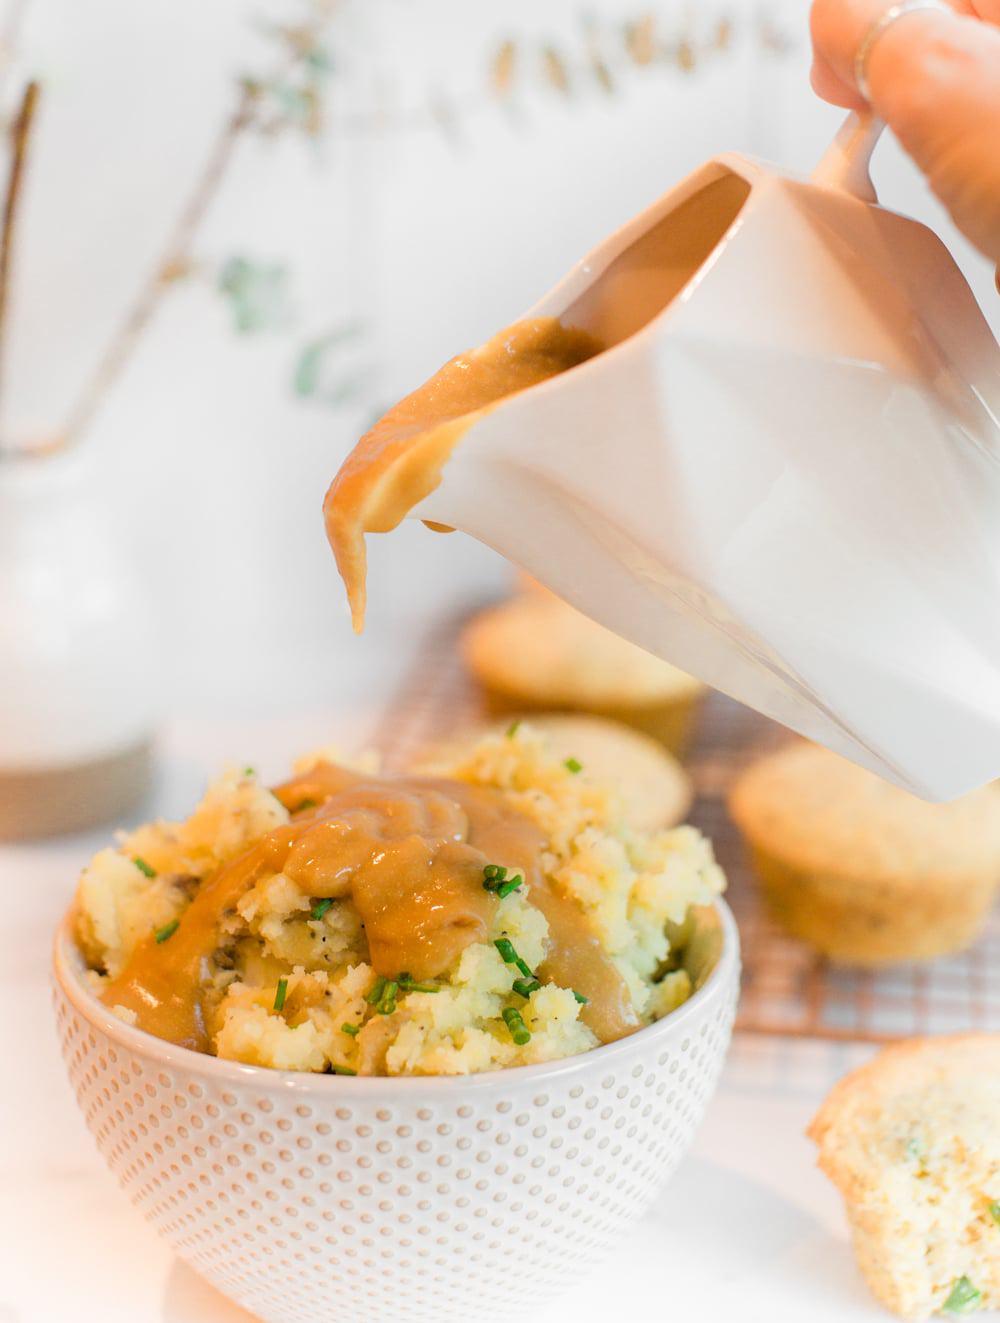 Vegan Gravy and Garlic Mashed Potatoes